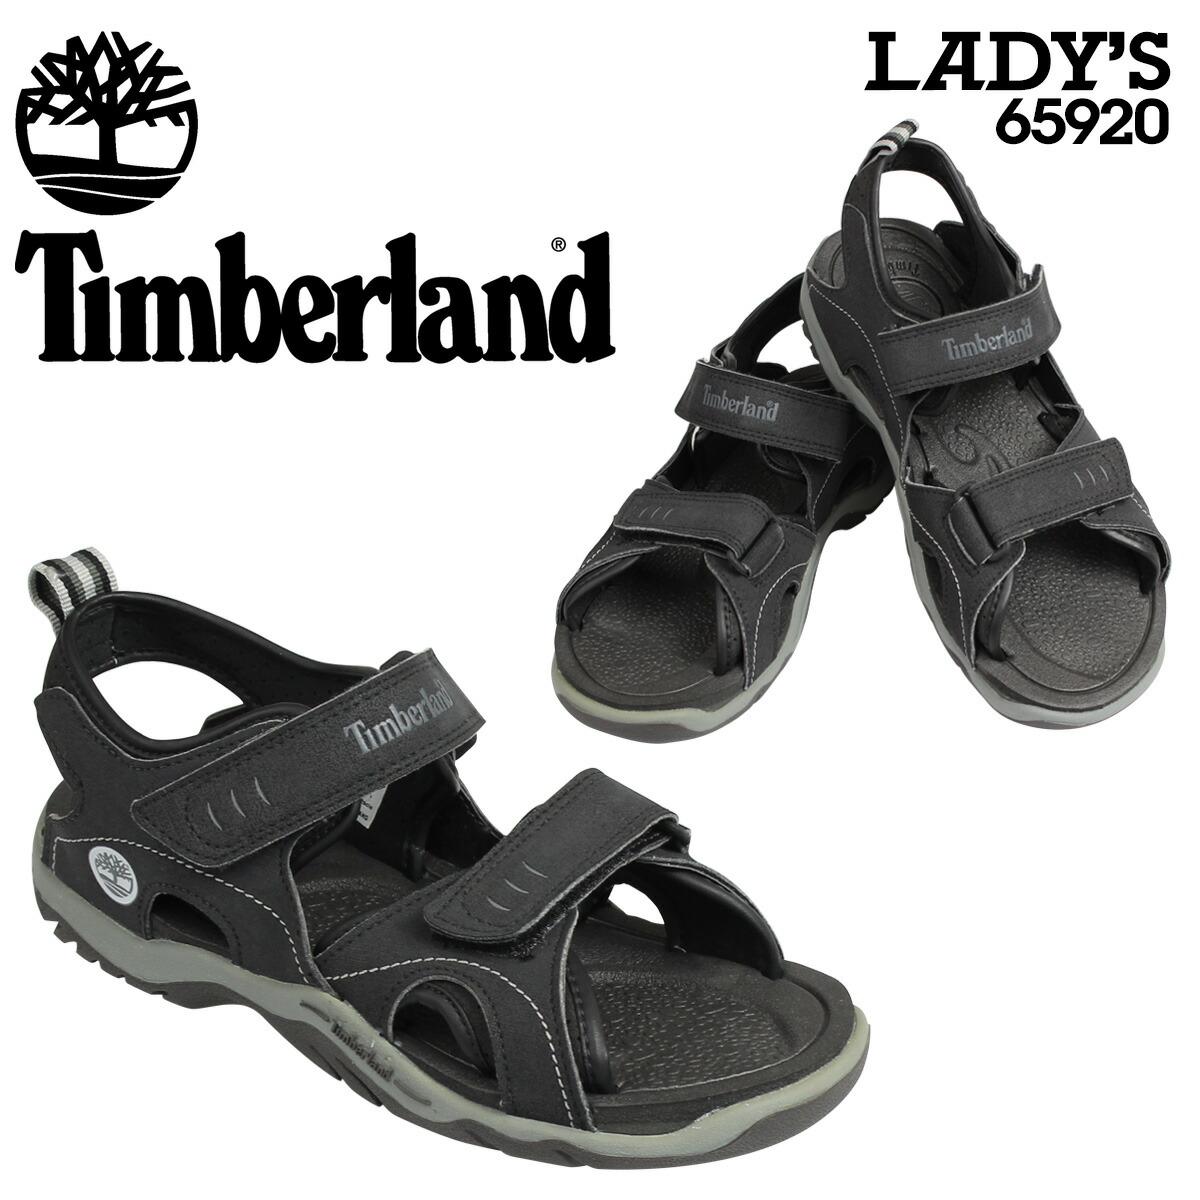 7ae35ebc4b639 Bye timberland stock Laundry Bye shoes greece t0qw4S